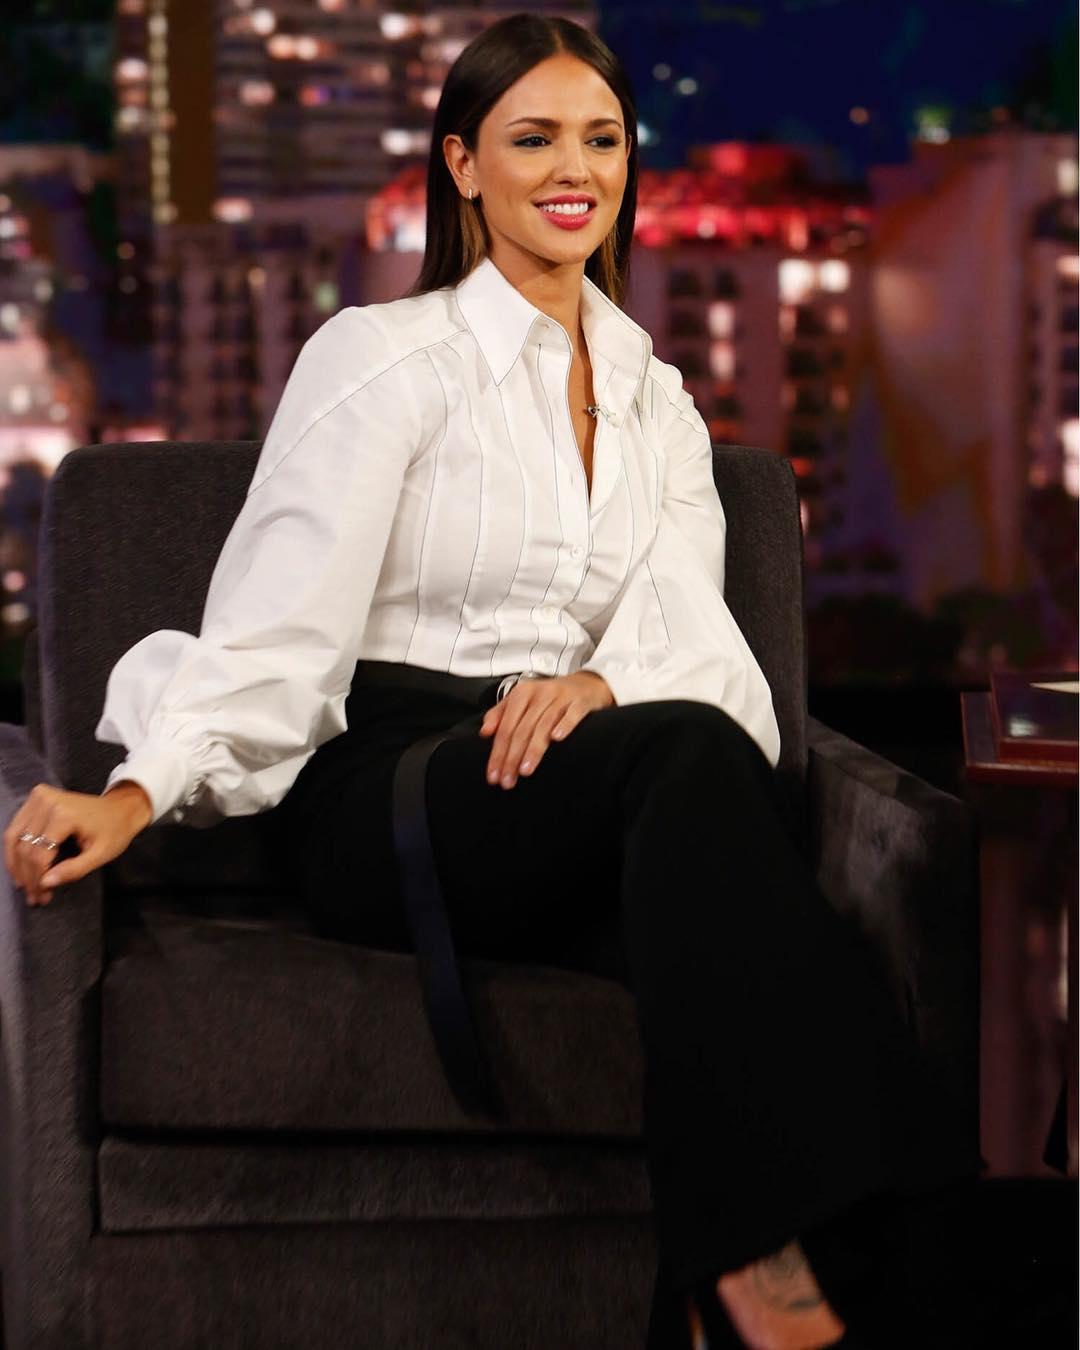 nhan sắc nữ diễn viên Eiza González